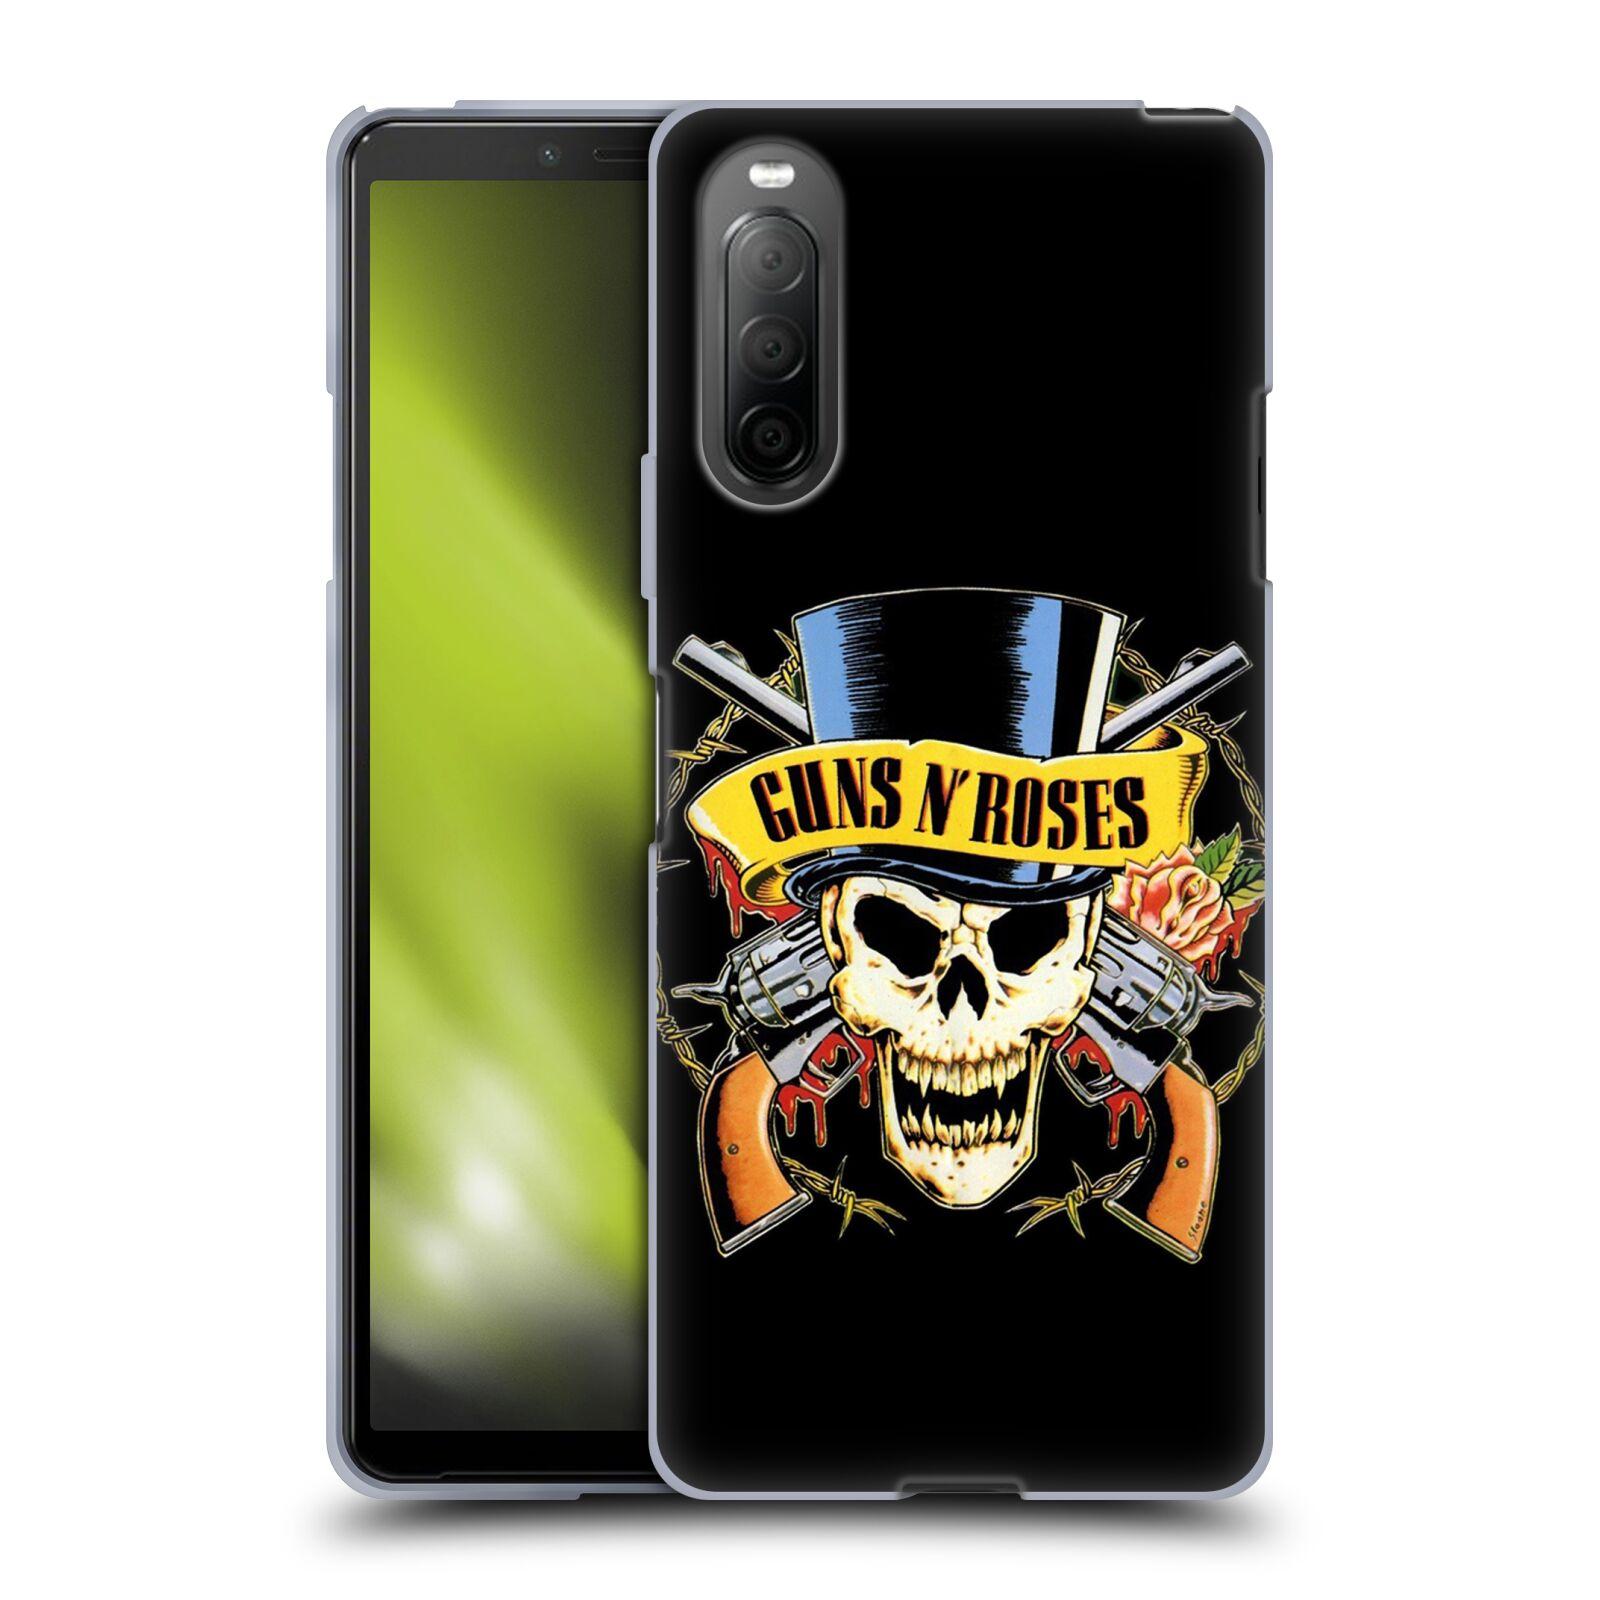 Silikonové pouzdro na mobil Sony Xperia 10 II - Head Case - Guns N' Roses - Lebka